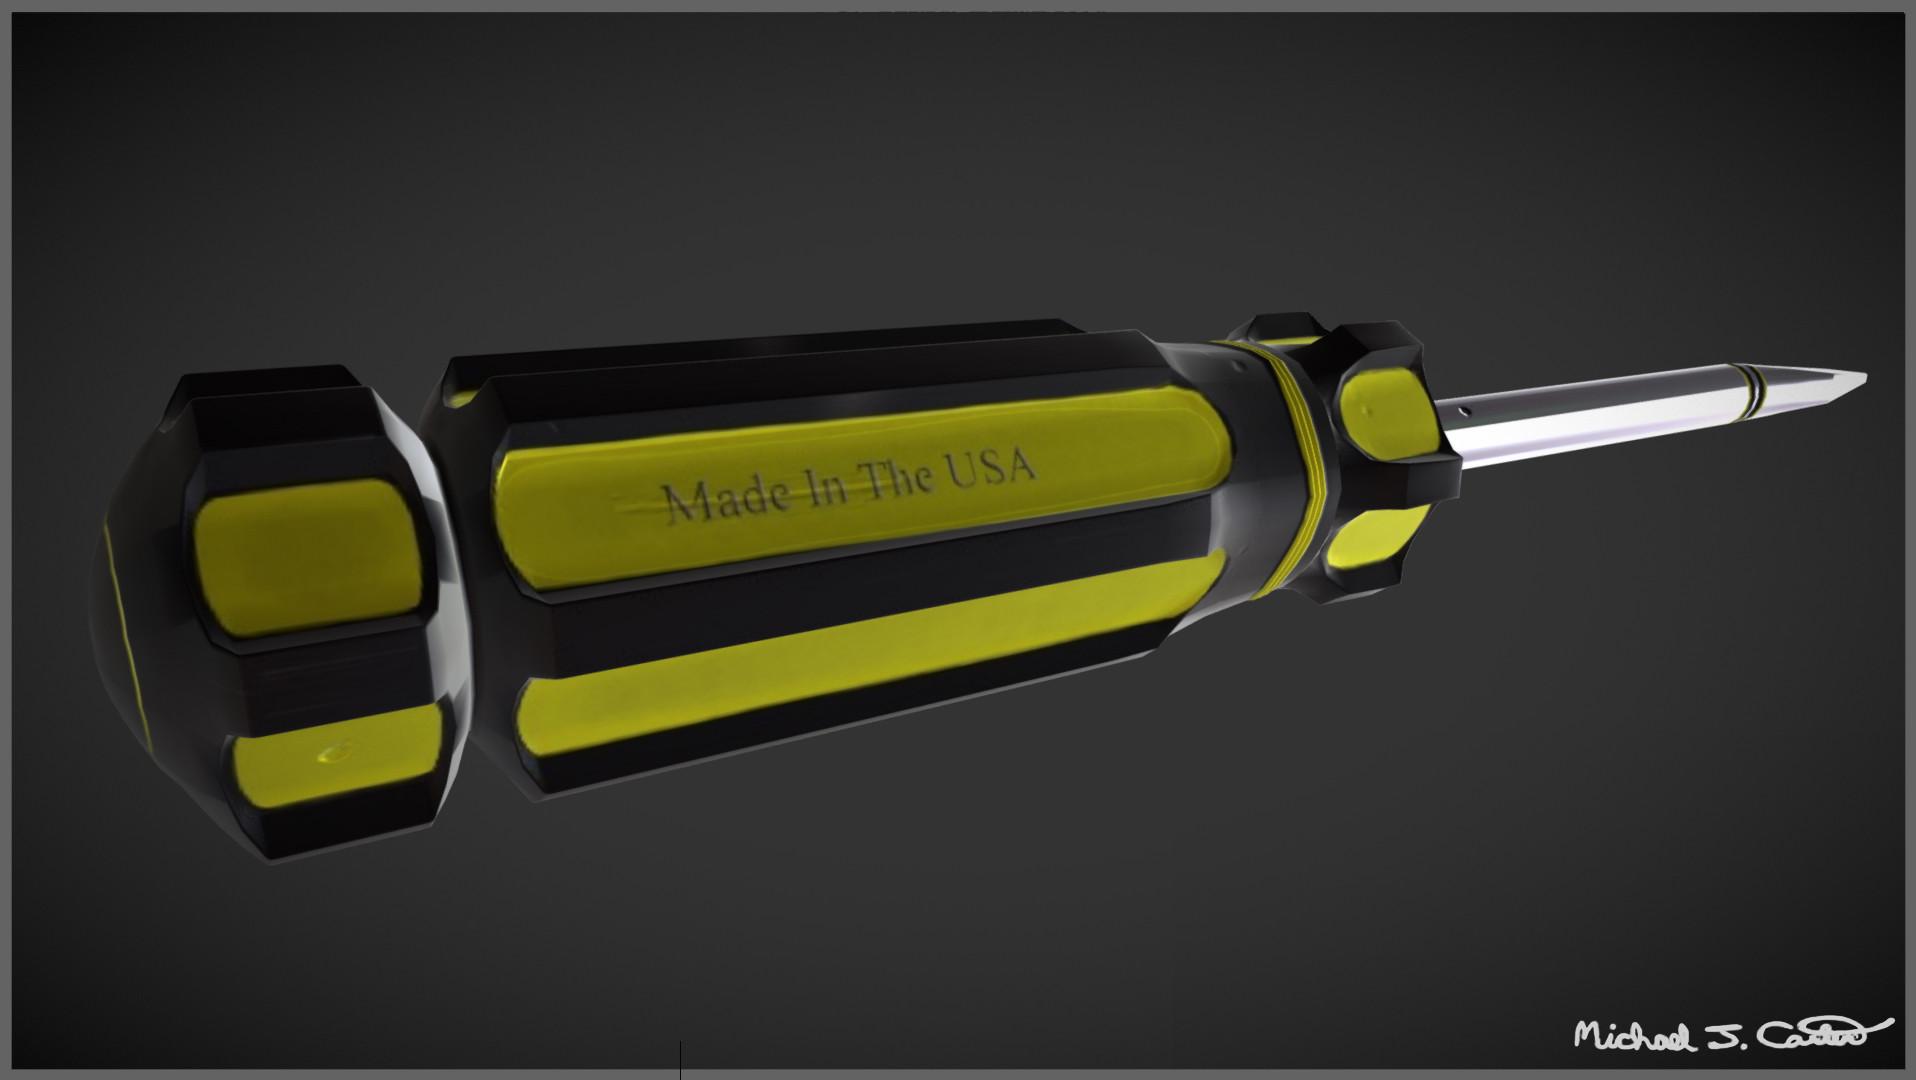 Michael jake carter mcarter screwdriver right side image